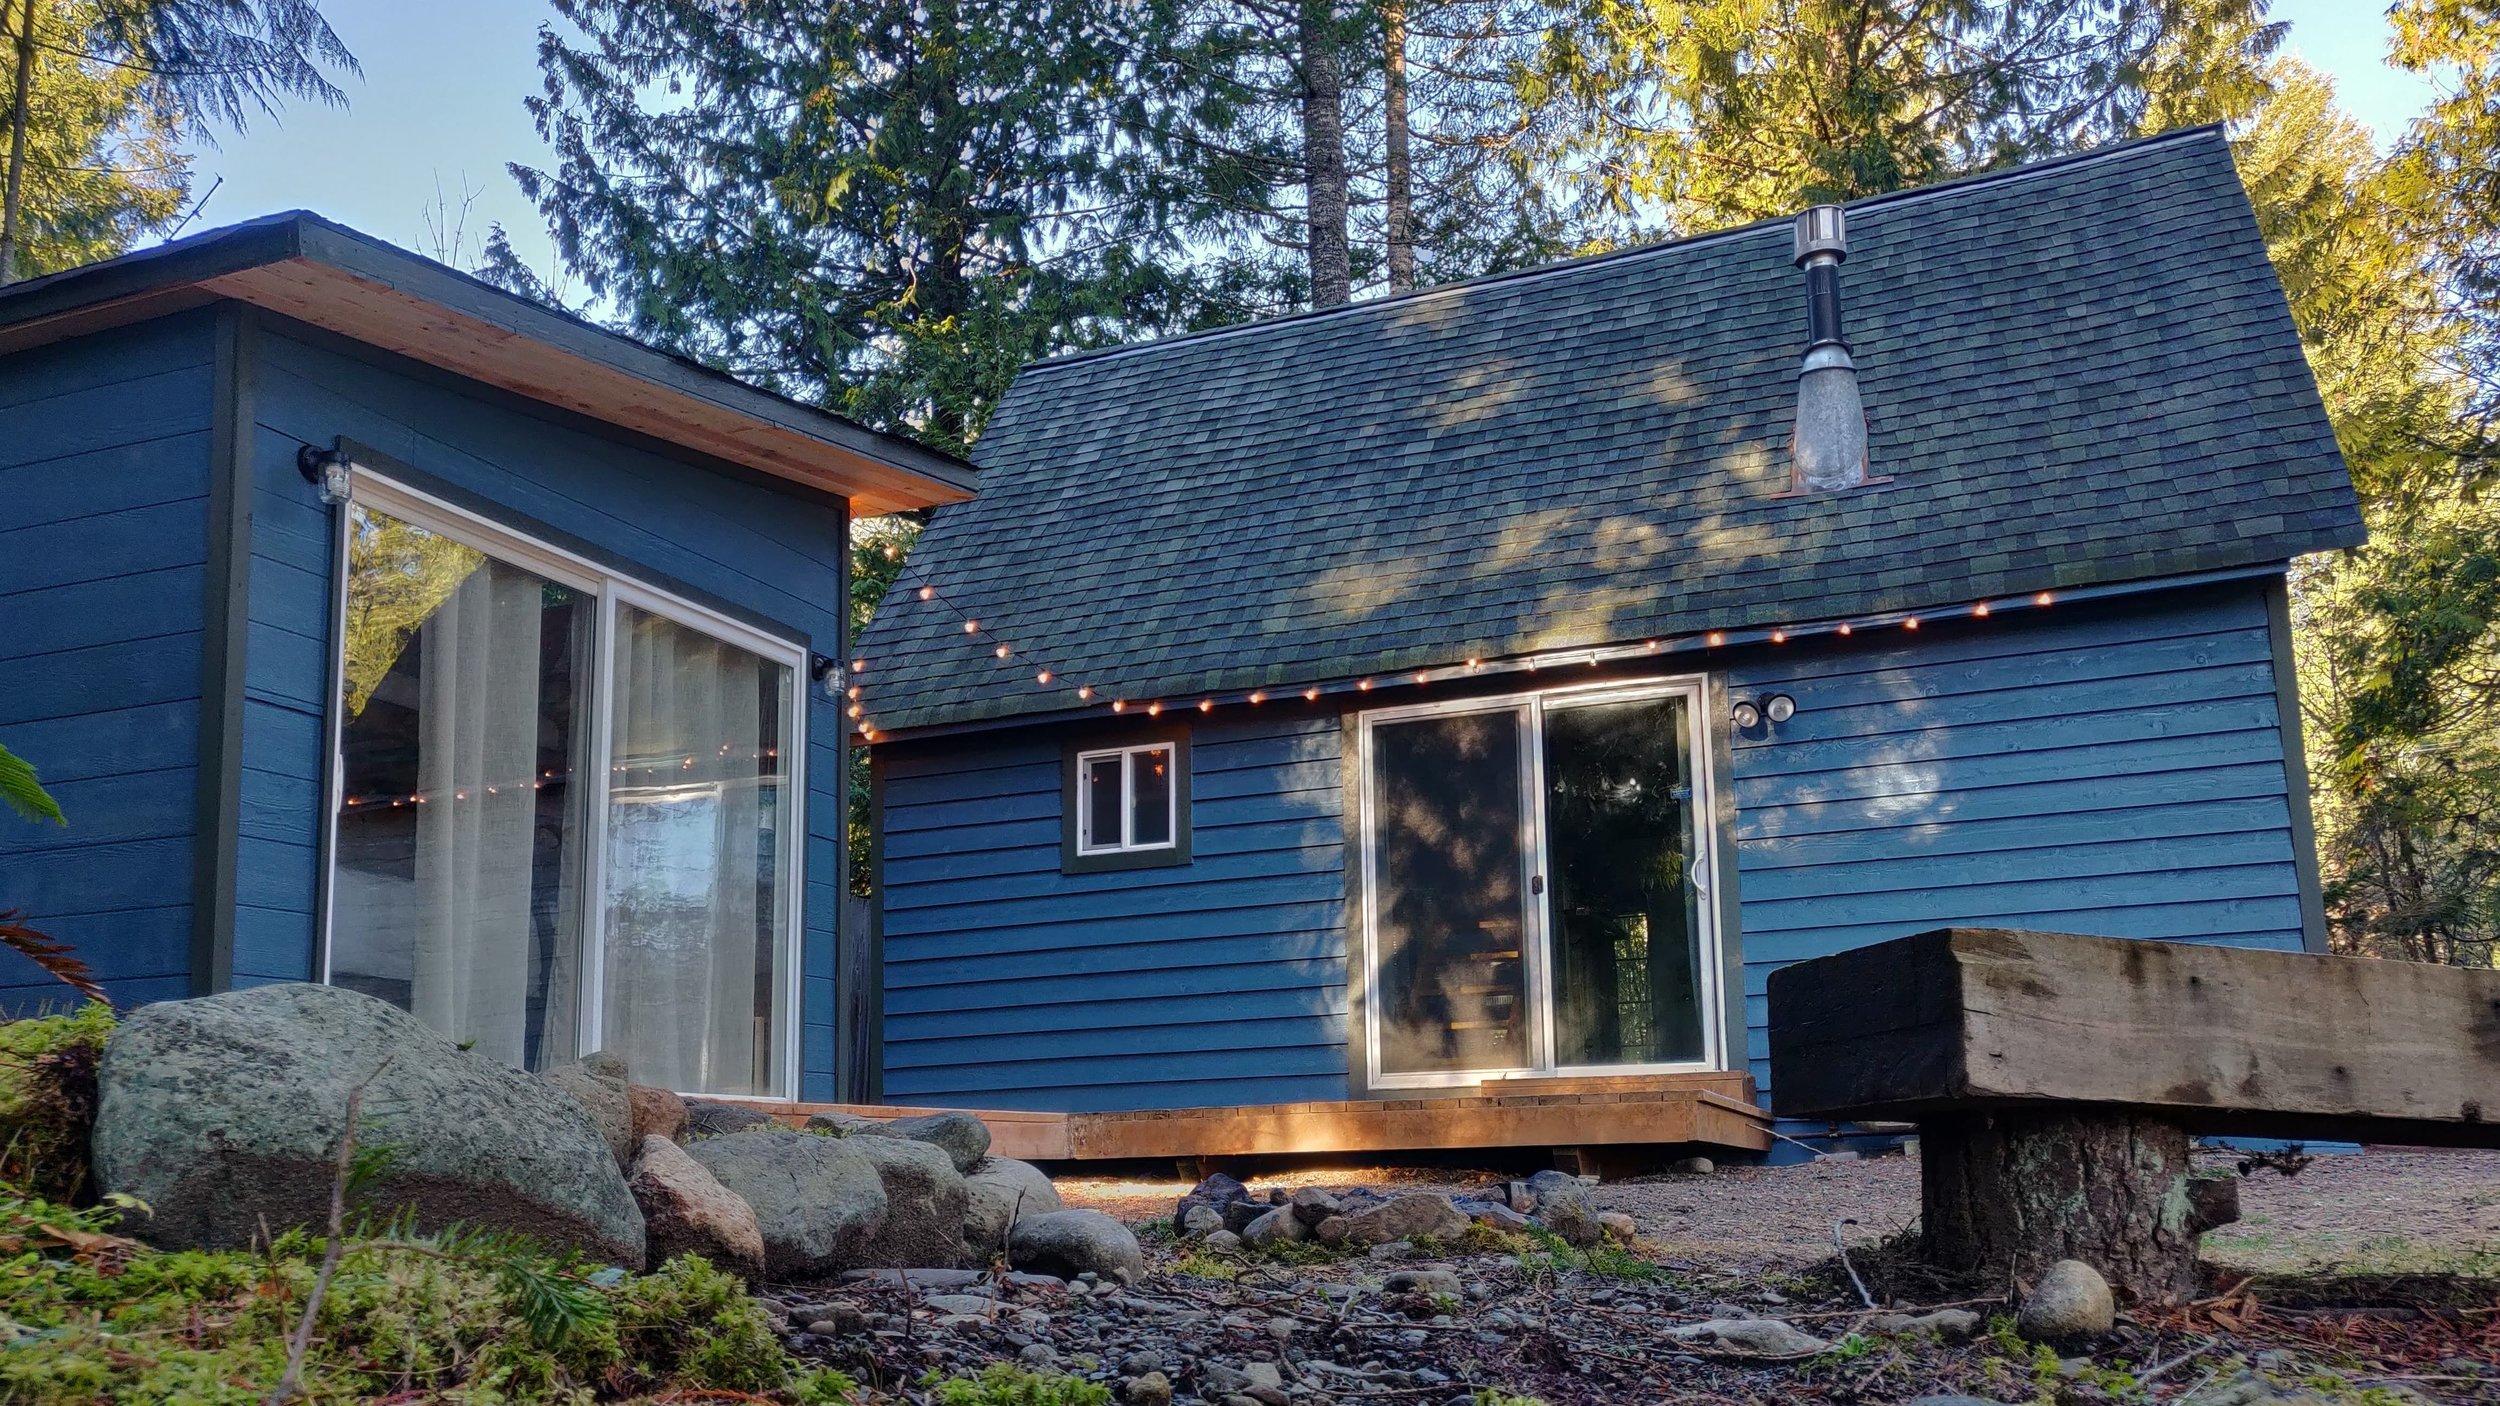 Millard's Cabin in Packwood, Washington